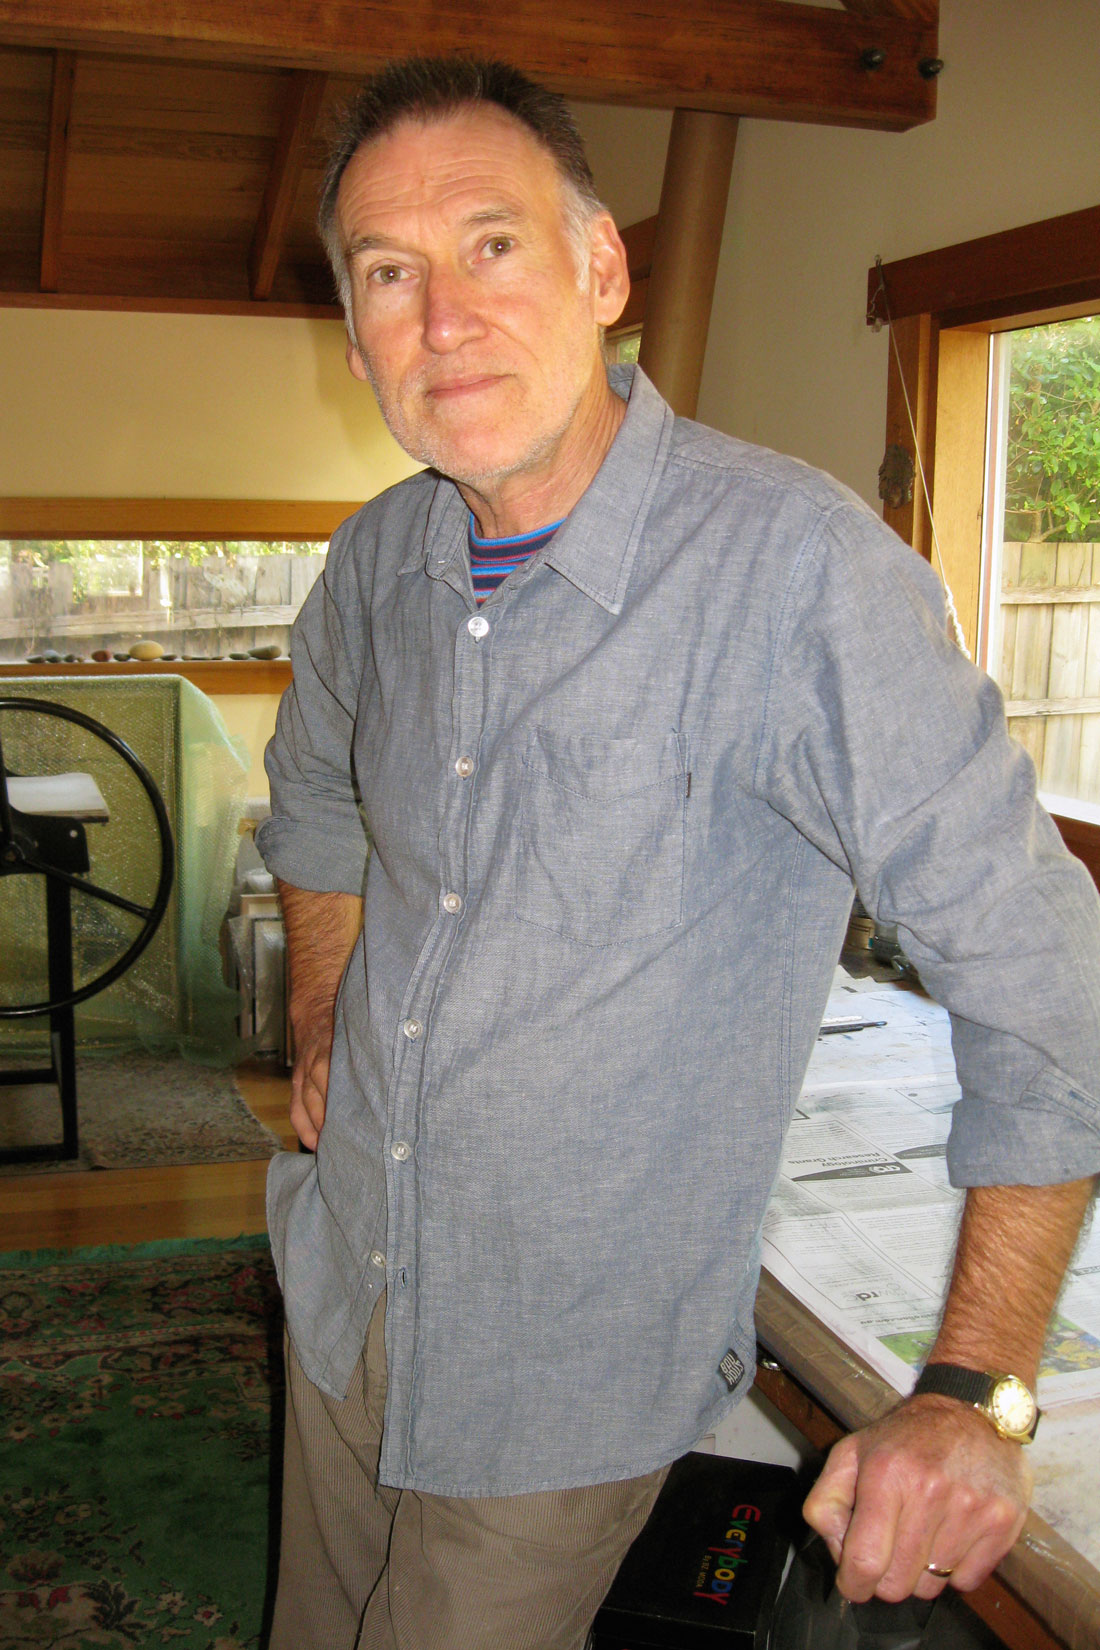 Wayne Viney